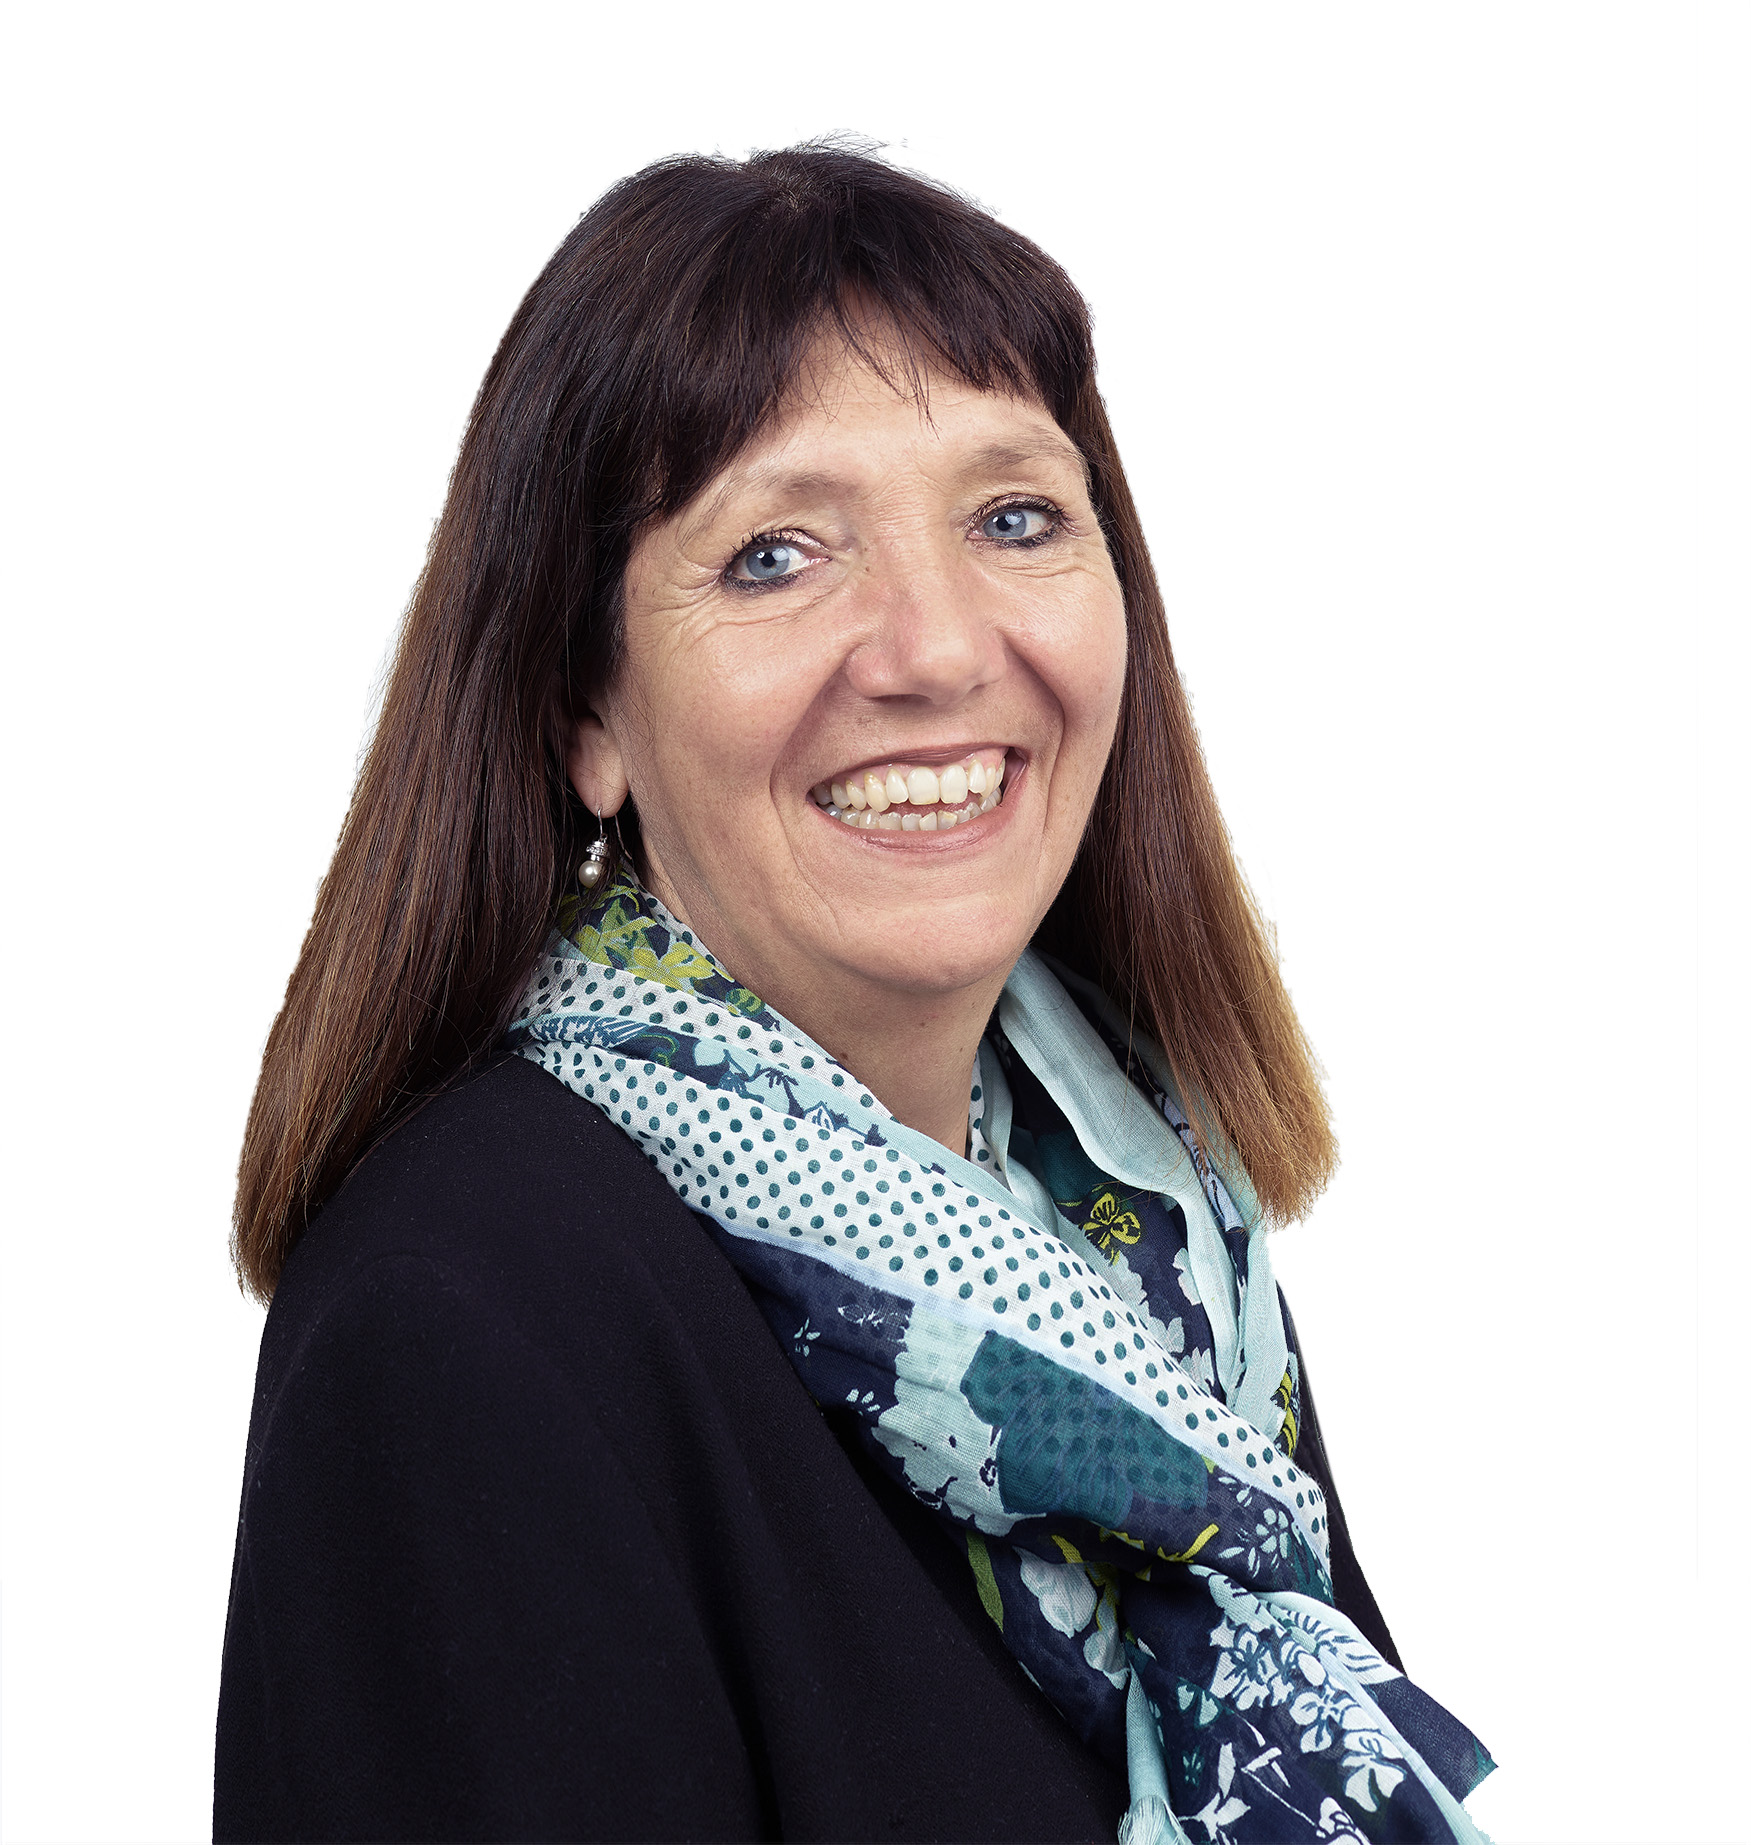 Martine Gilliéron